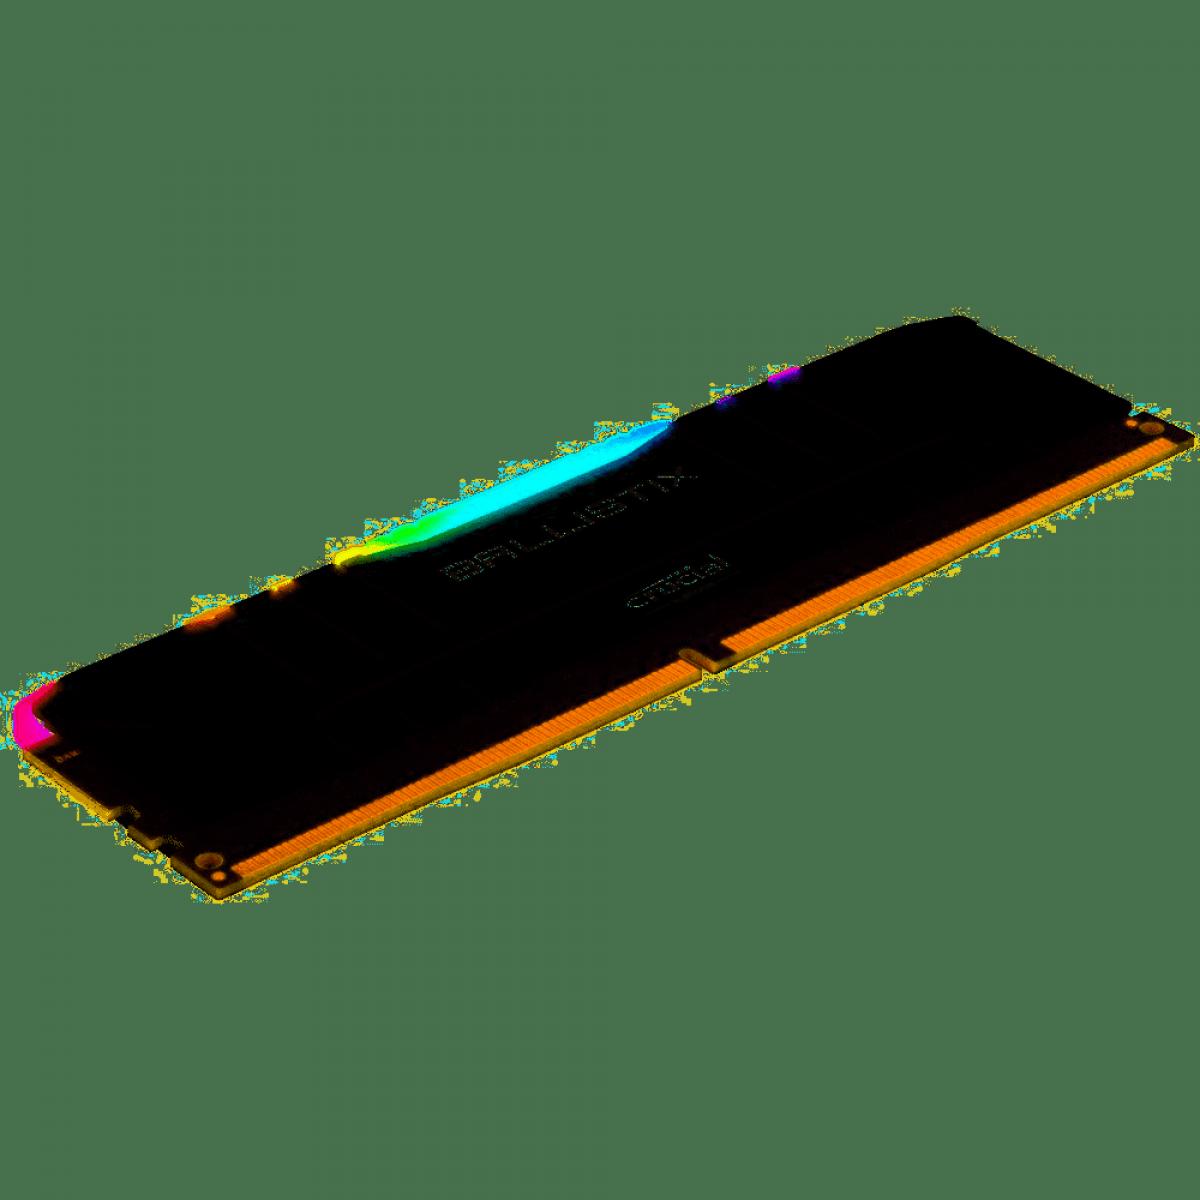 Kit Dual Channel 16GB (2x8GB) Memória DDR4 Crucial Ballistix, 8GB, 3200MHz, RGB, Black